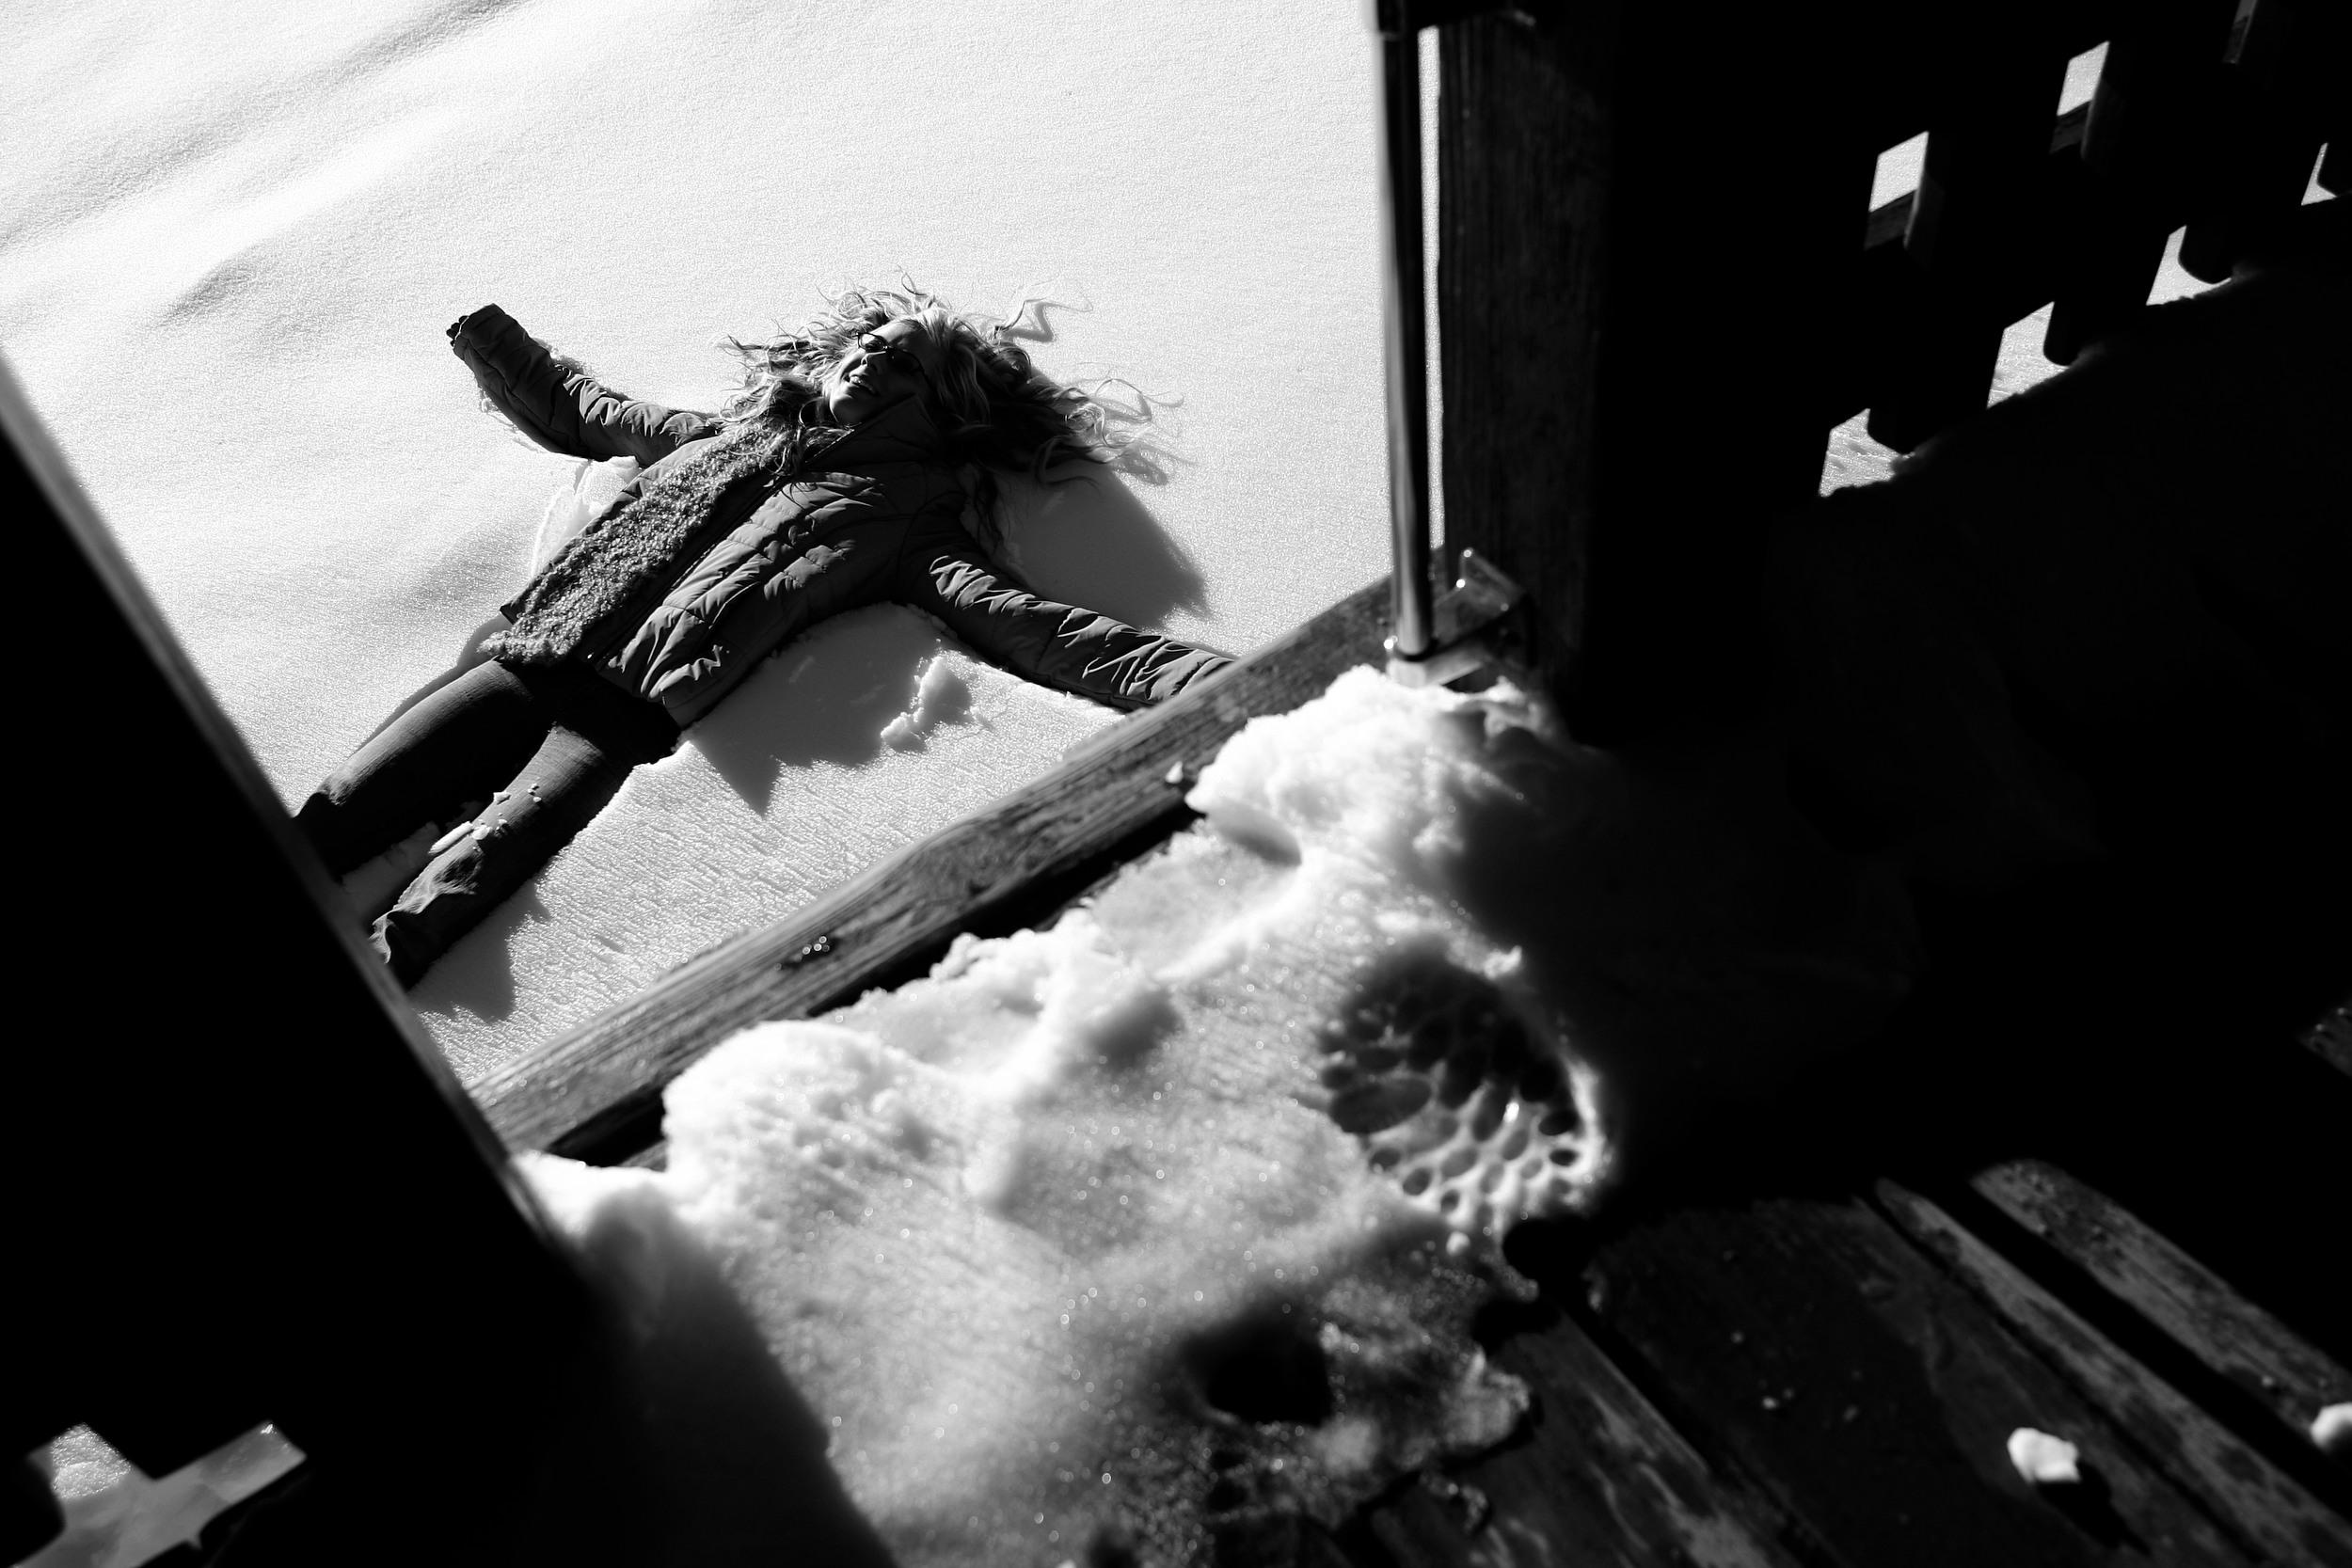 GIRL IN SNOW © TODD SPOTH